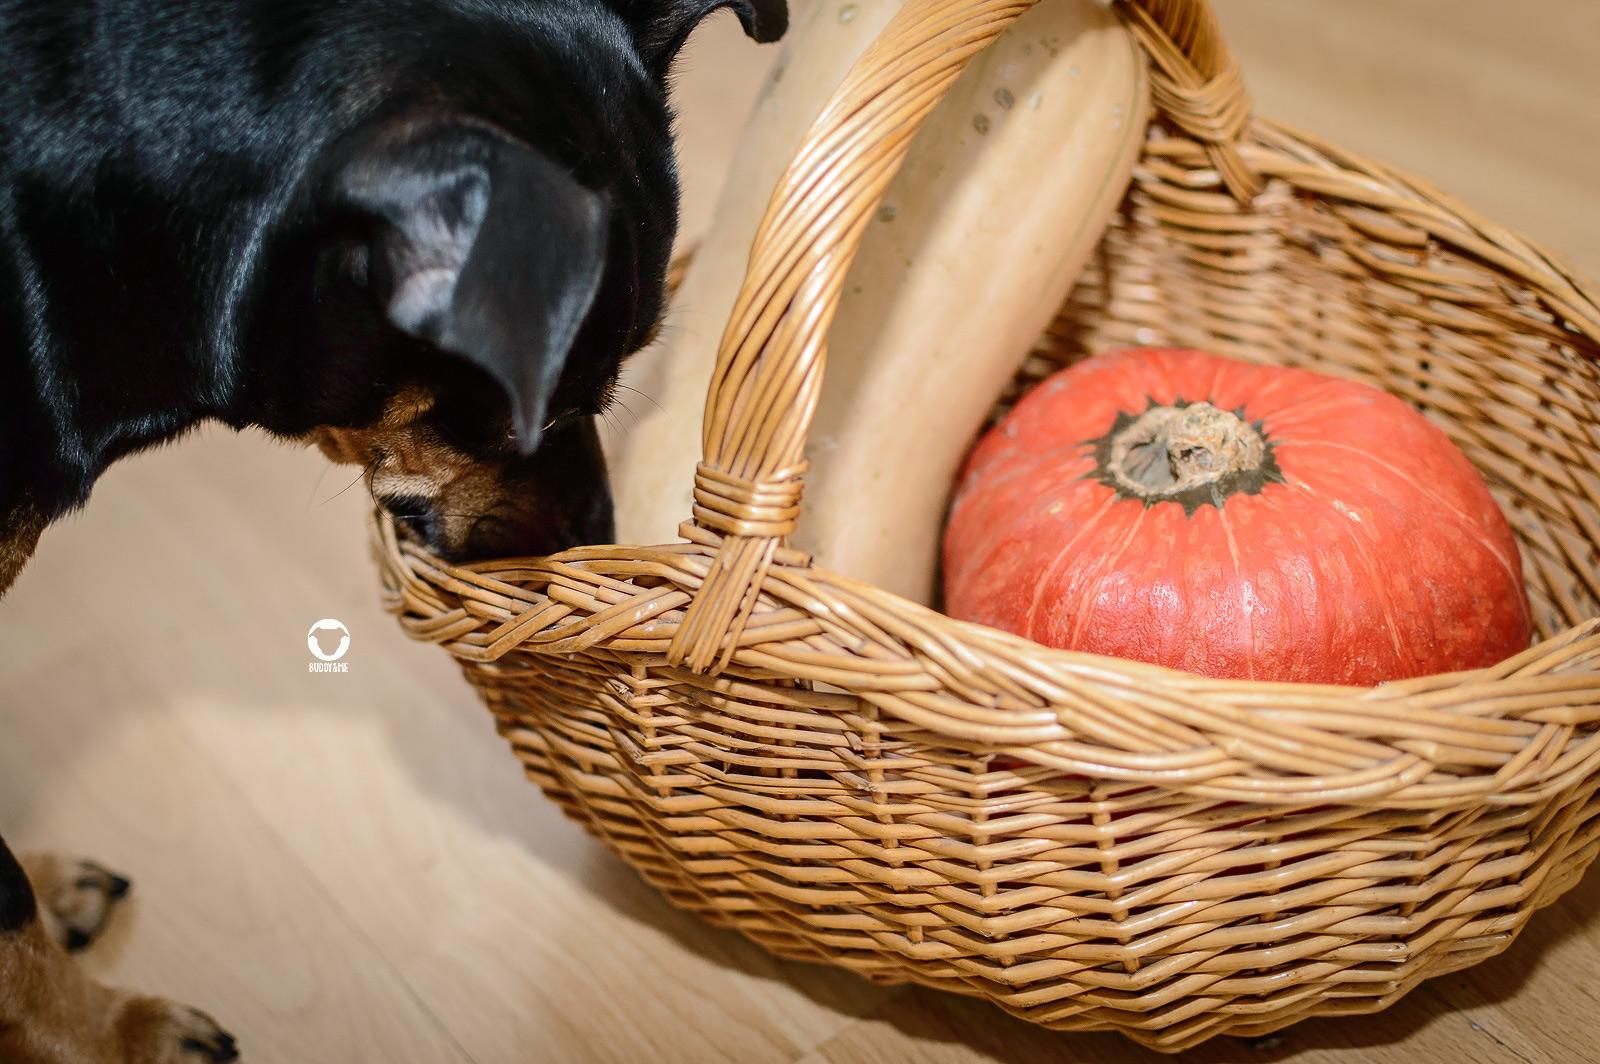 Pinscher Buddy, Buddy and Me, Hundeblog, Dogblog, Ernährung, Rezepte, Barfen, Herbst, Kürbis, Gemüse, gesund, lecker, Kürbissuppe